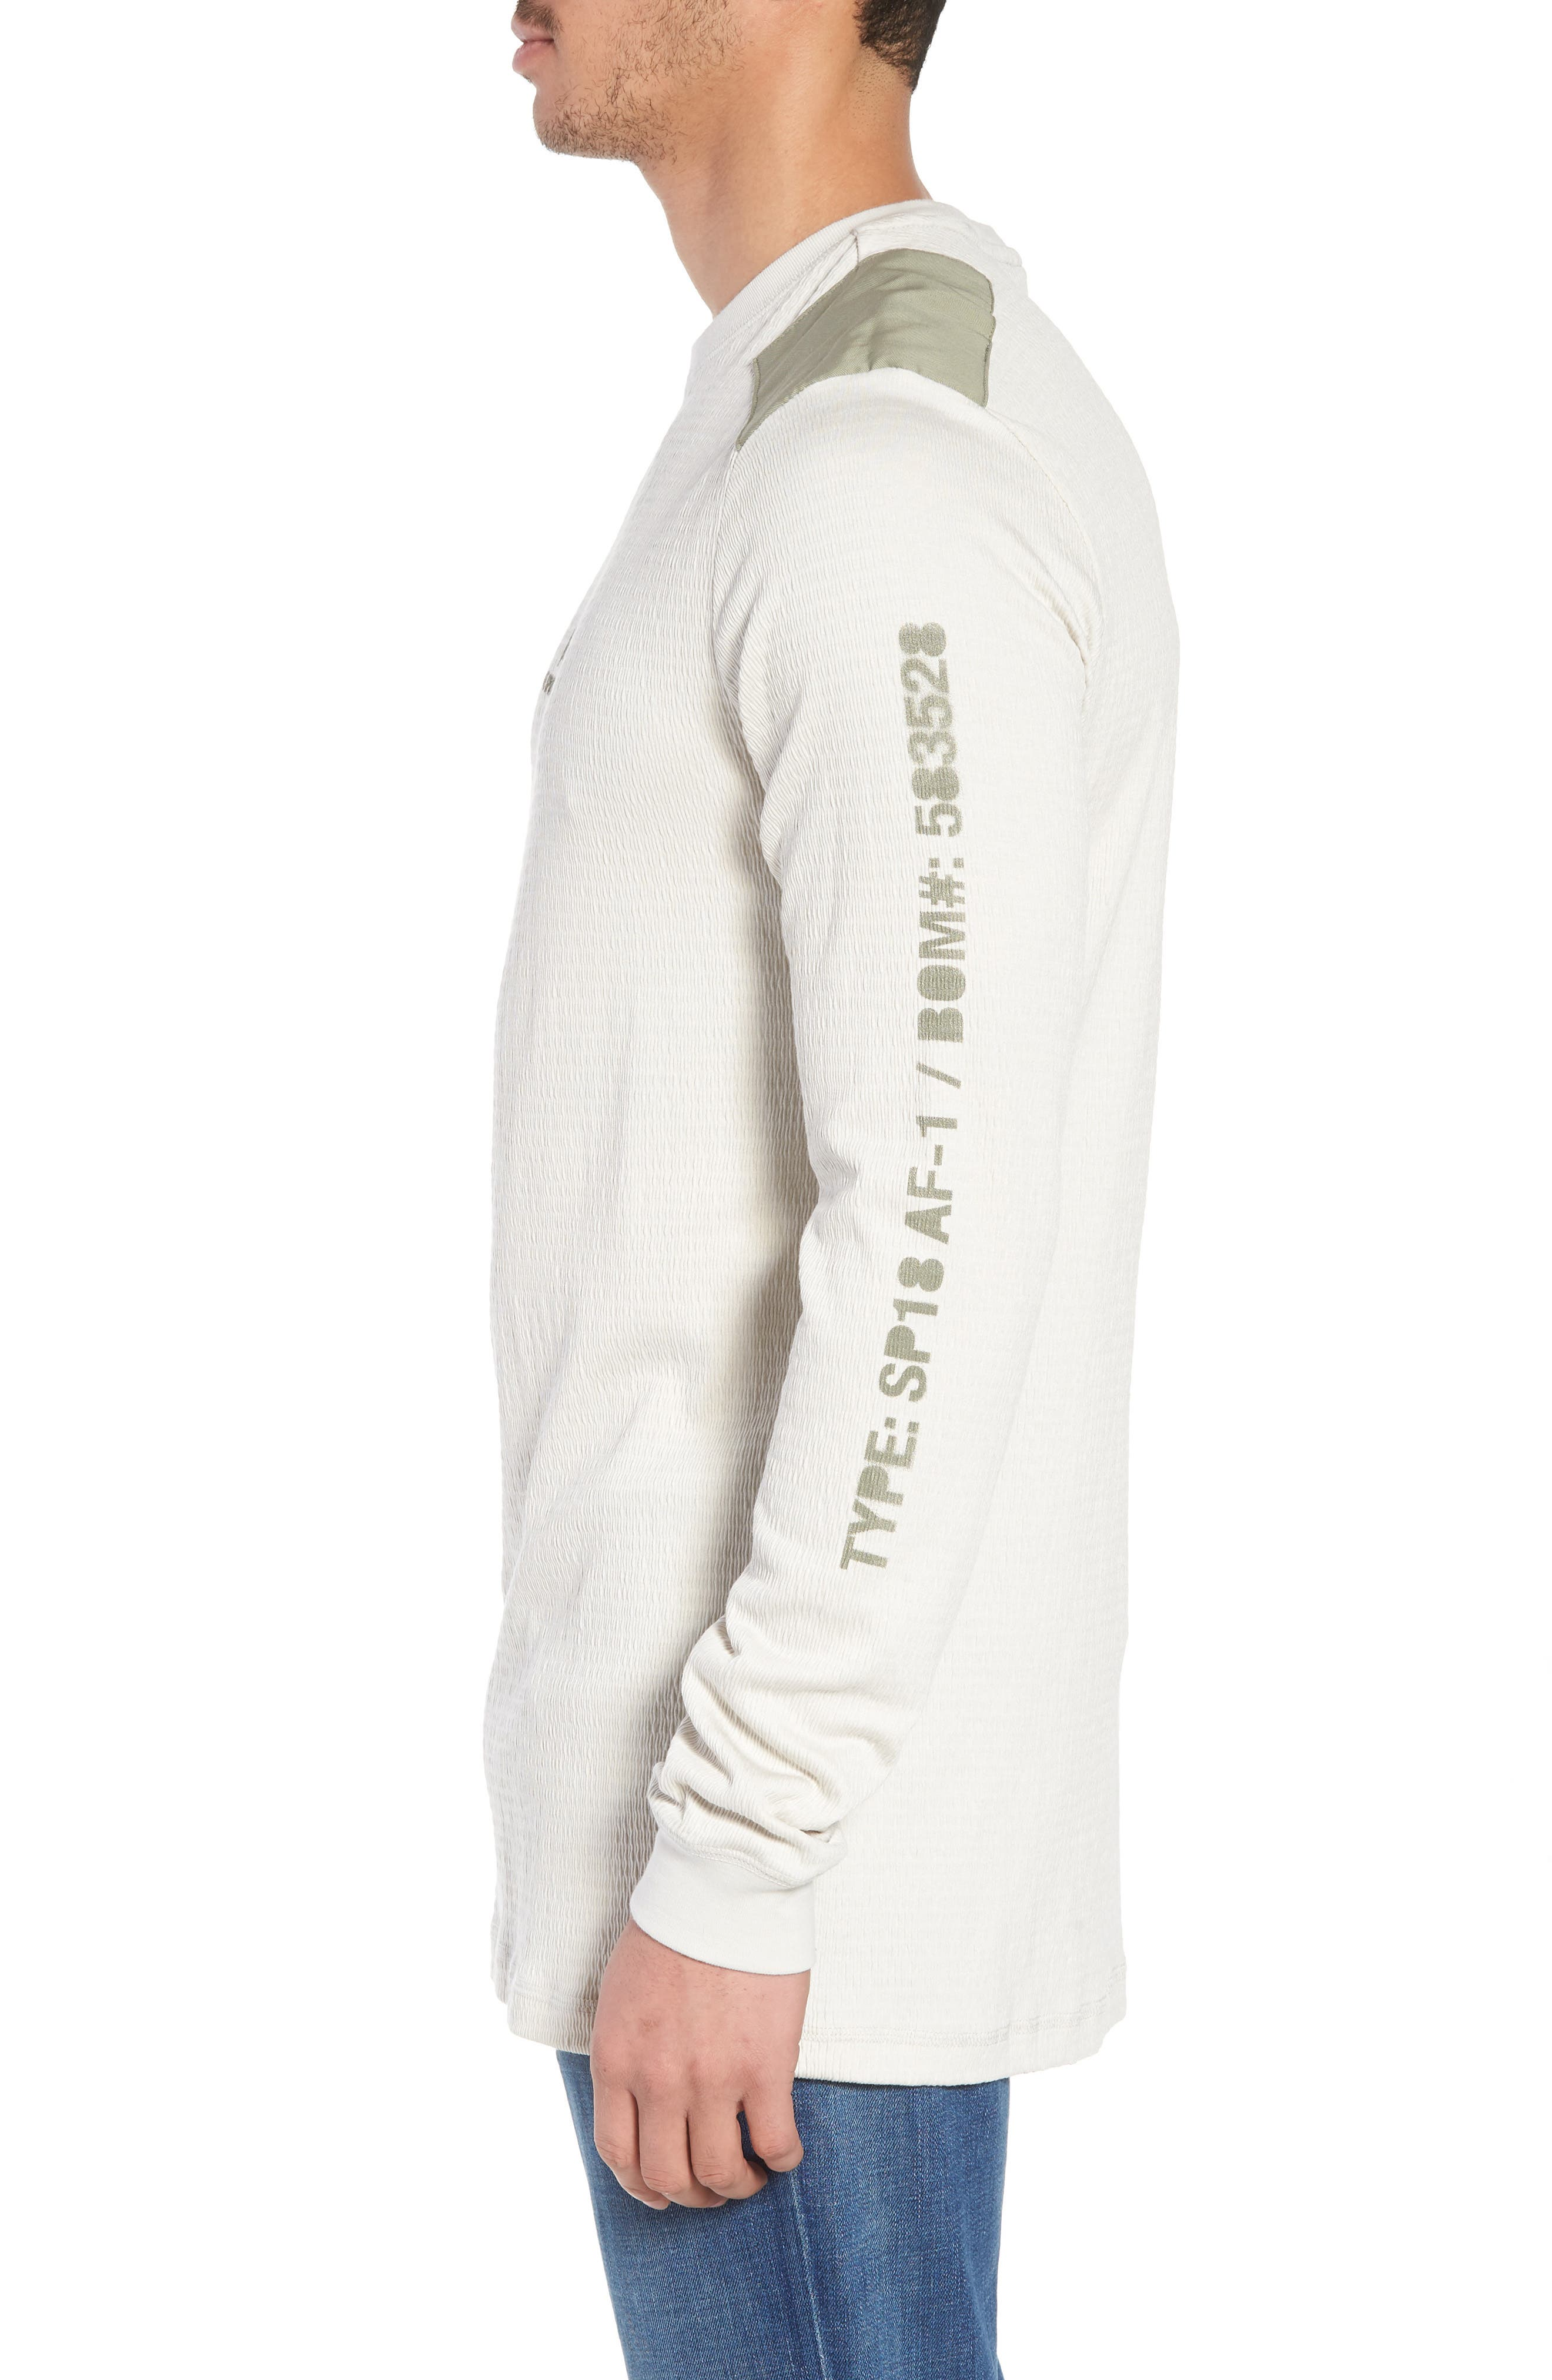 Sportswear AF-1 Long Sleeve Shirt,                             Alternate thumbnail 3, color,                             Light Bone/ Stucco/ Stucco